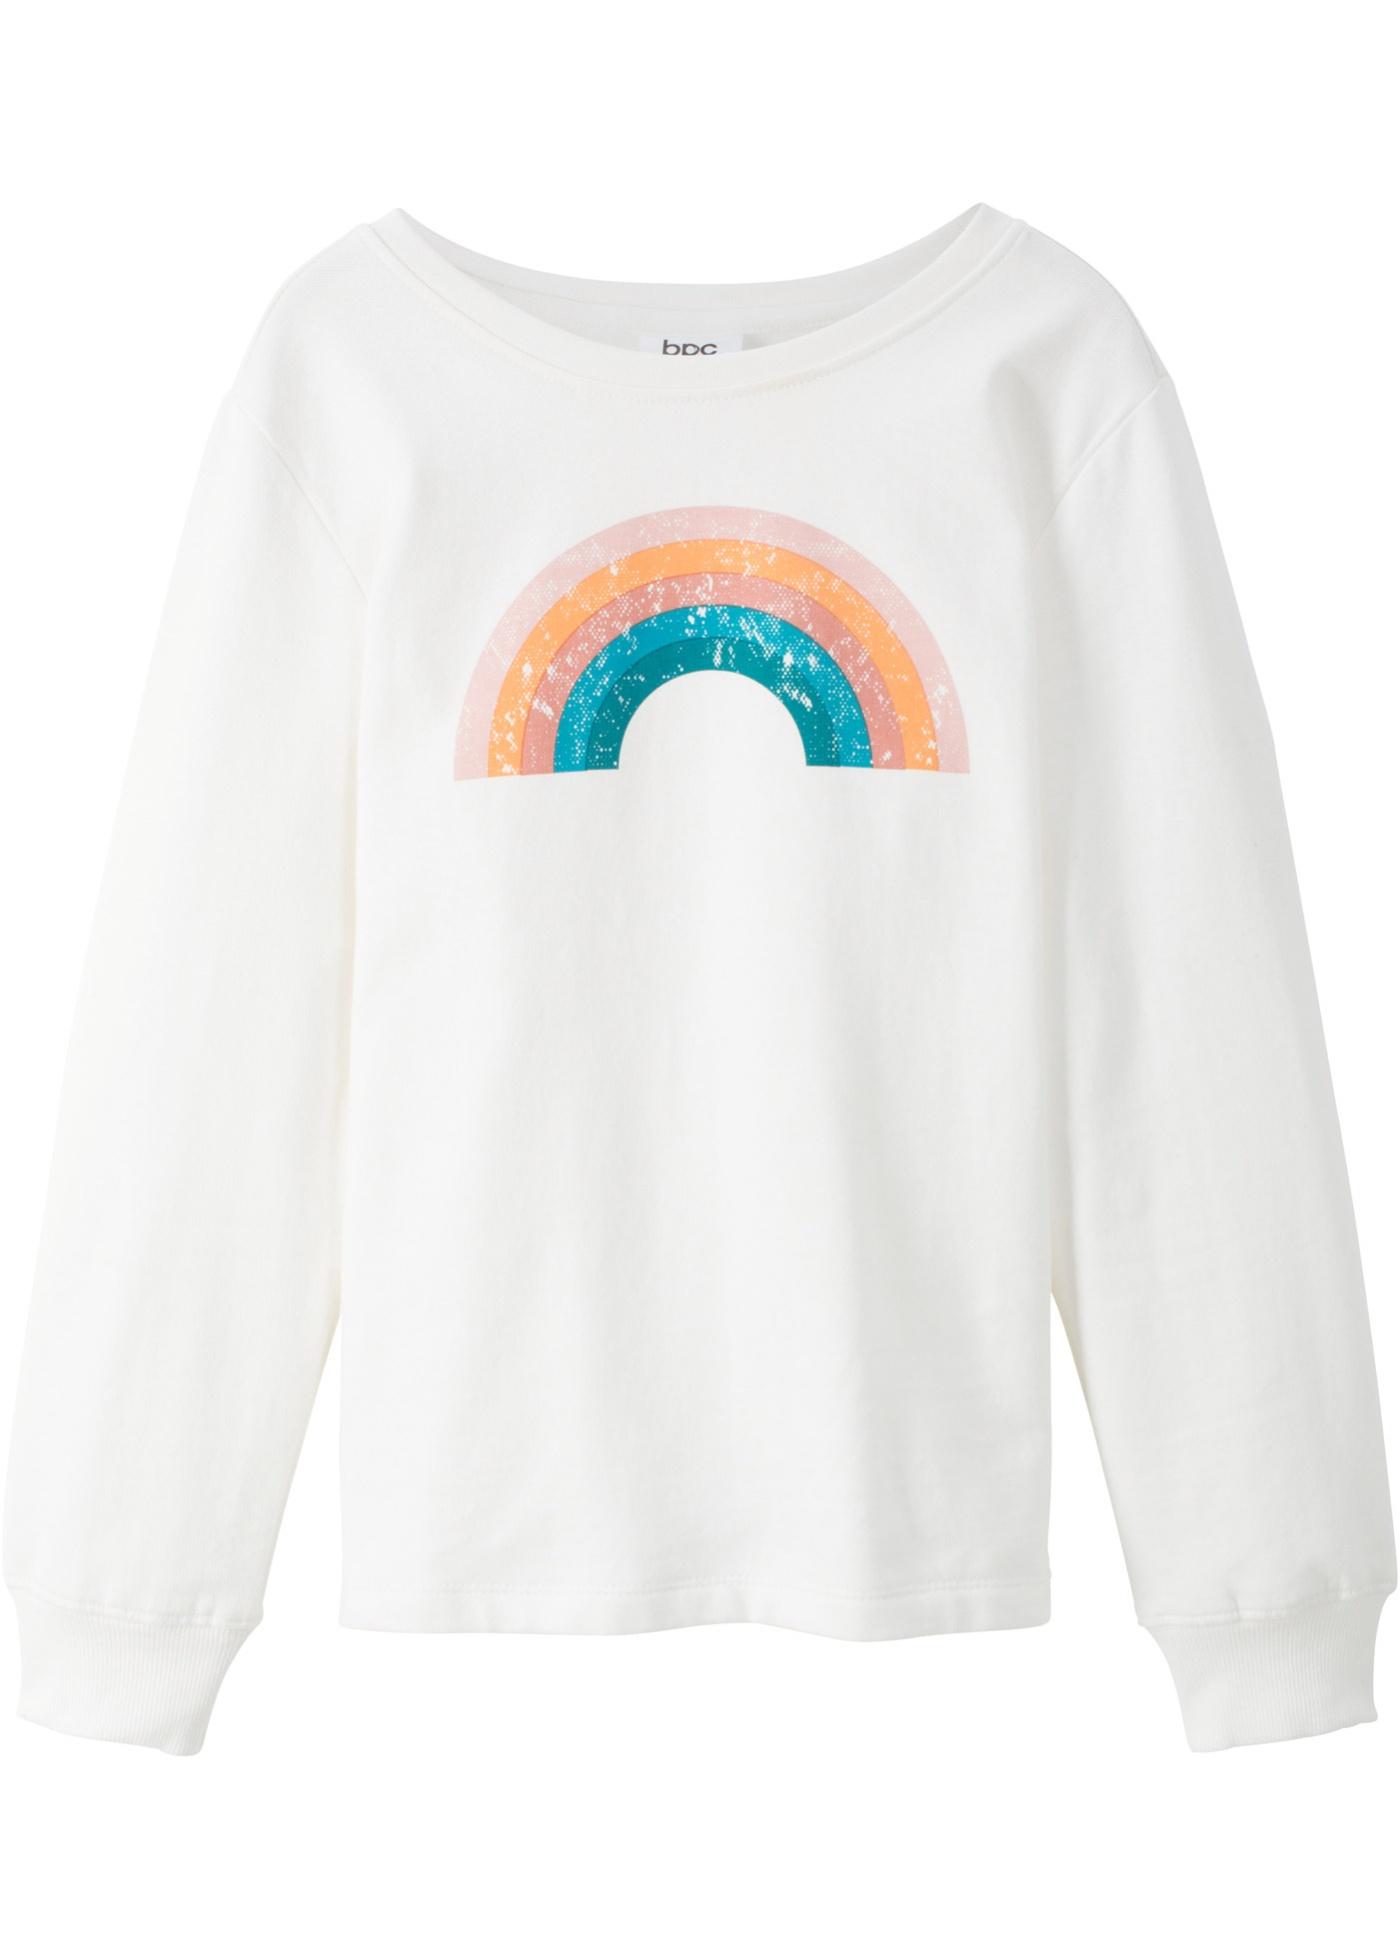 Sweatshirt mit Regenbogendruck